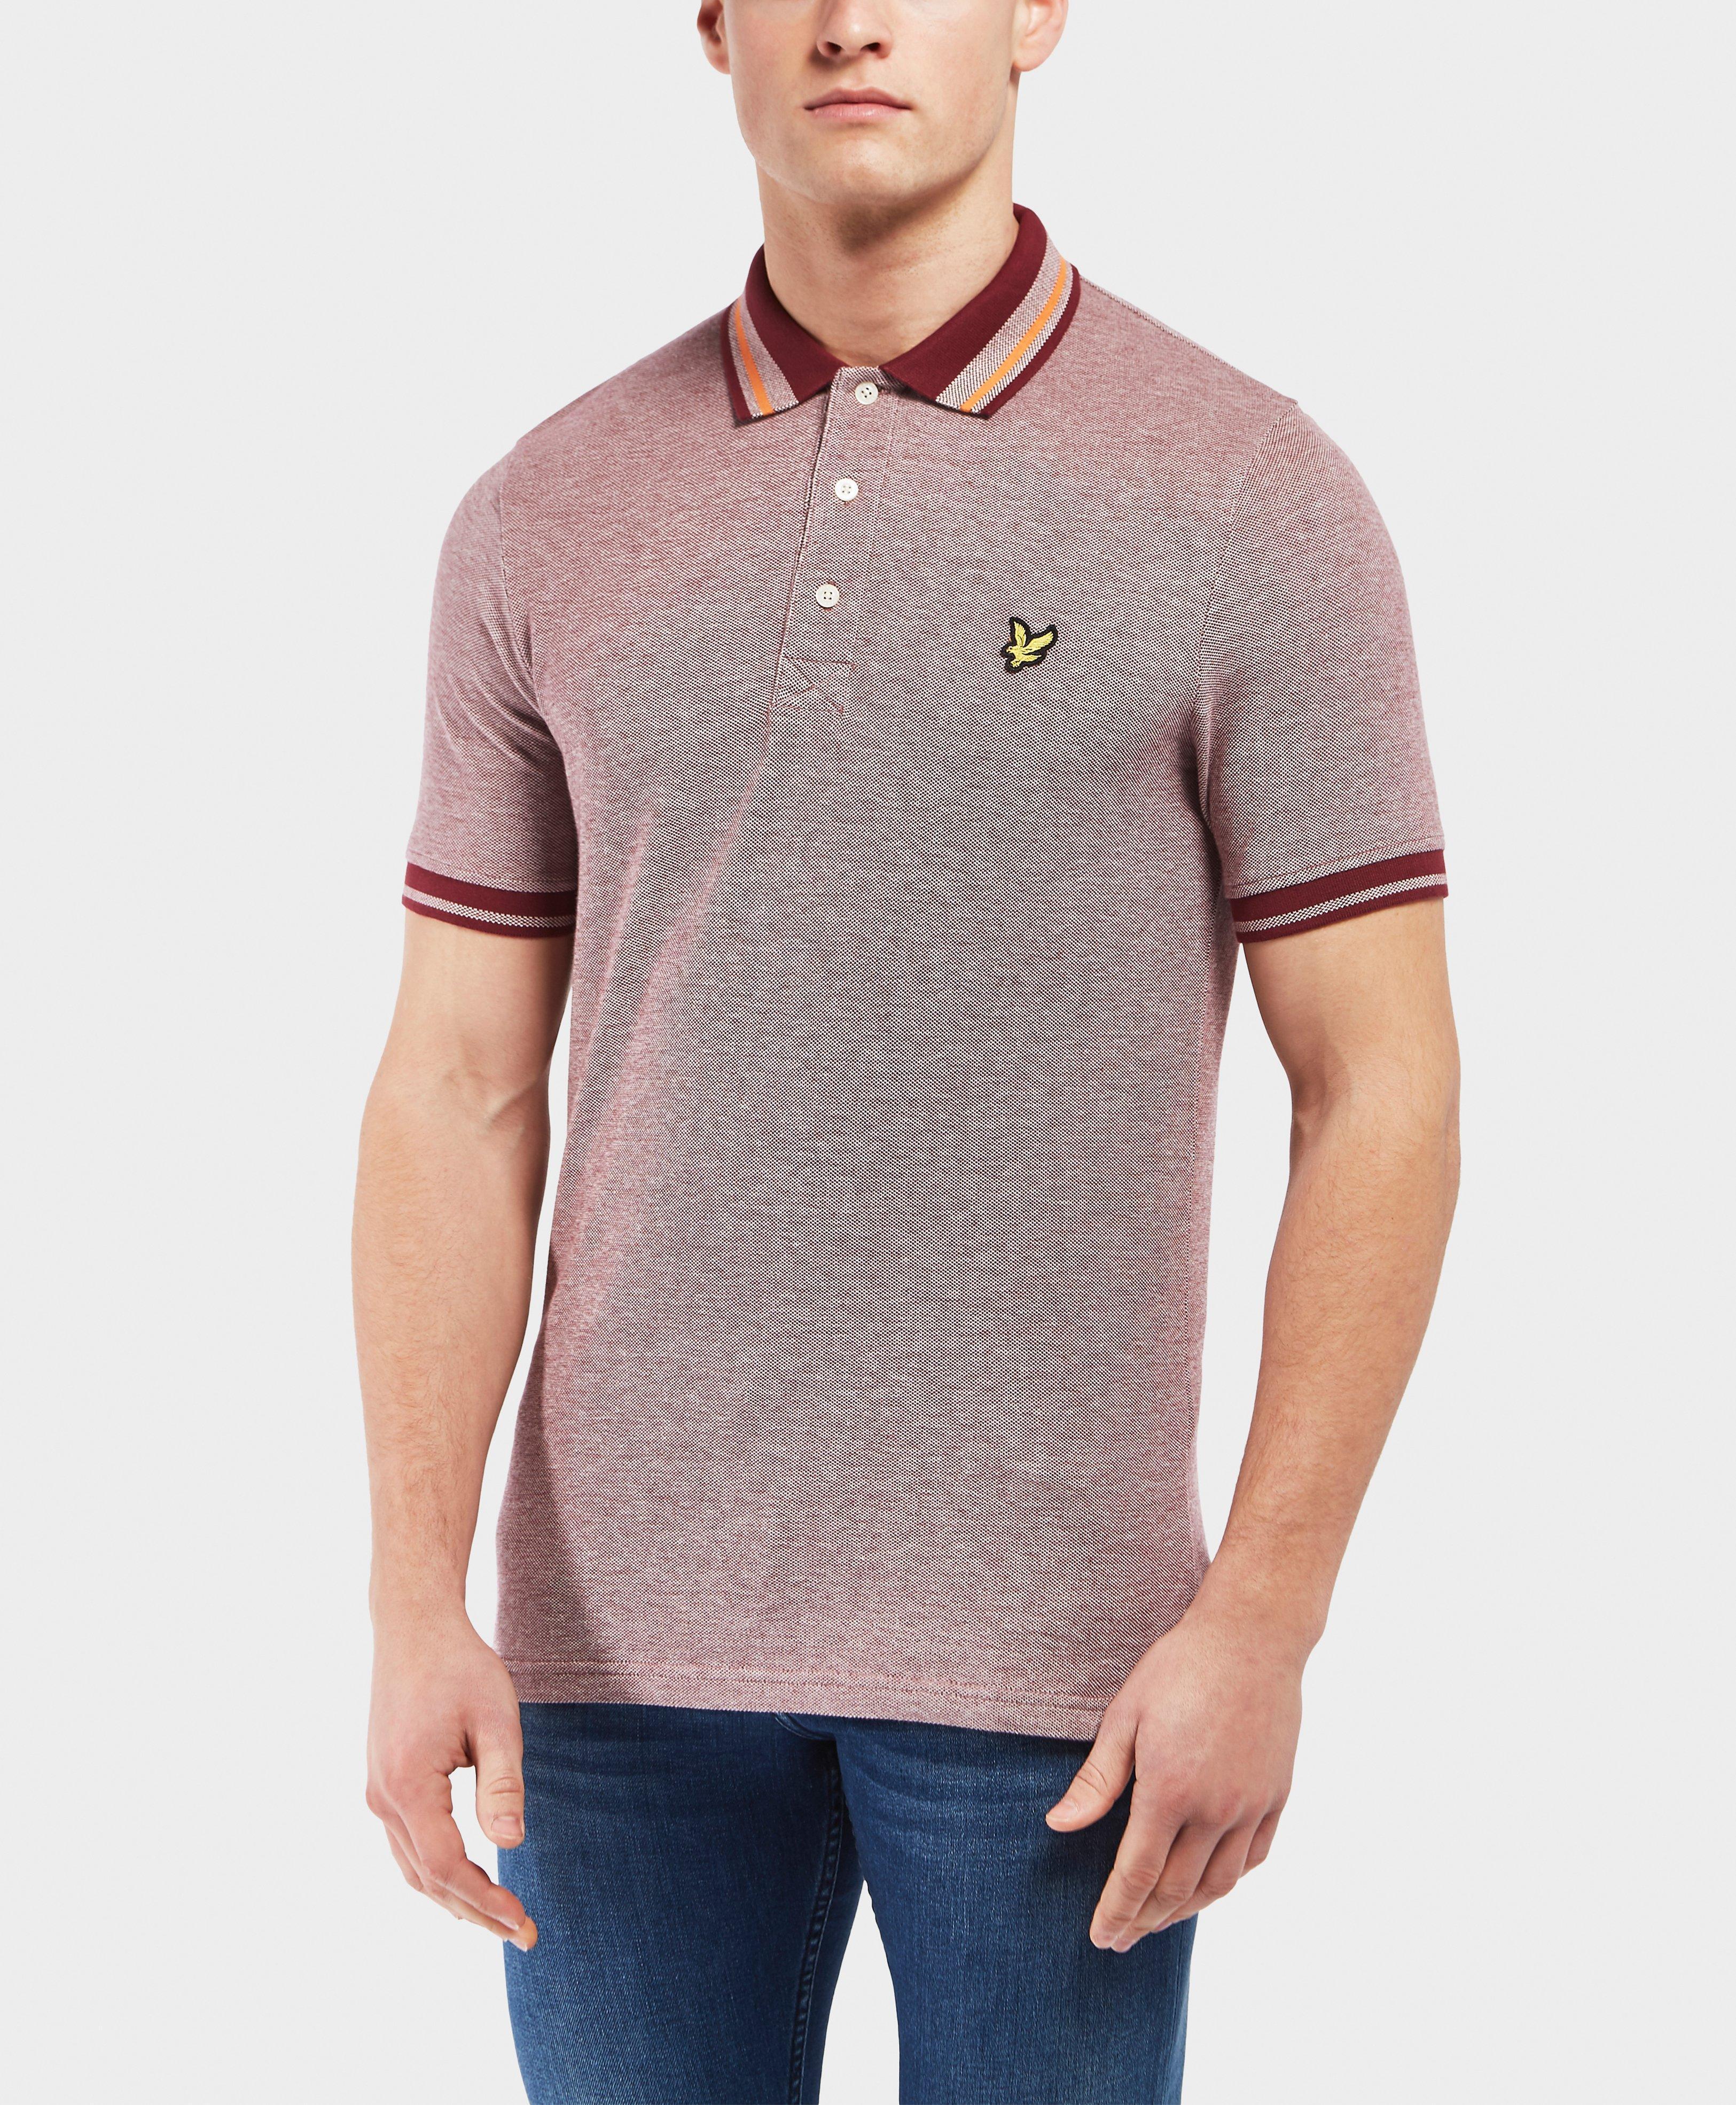 Mens Oxford Stripe Short Sleeve Polo Shirt Lyle & Scott Best Sale Sale Online btI7uvIW